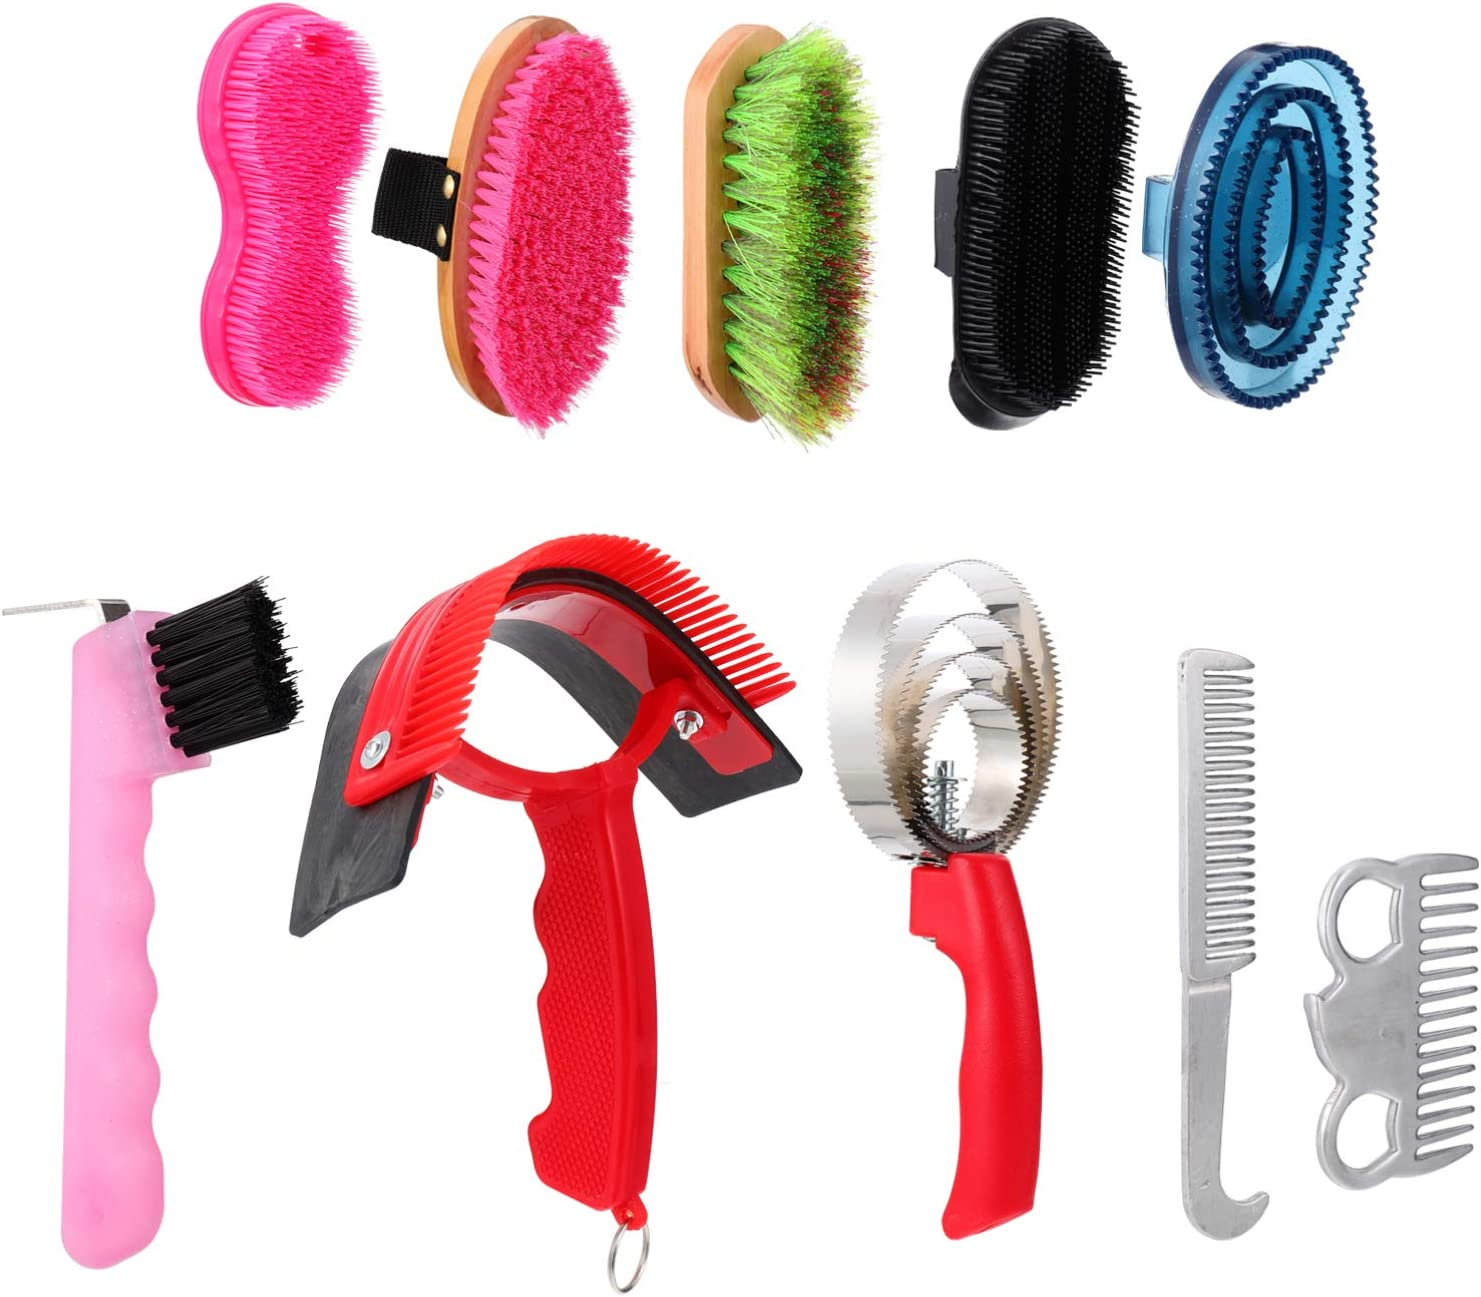 Balacoo 10Pcs Kit de Aseo de Caballos Juego de Cepillos de Limpieza de Caballos Profesionales Accesorios de Cuidado de Aseo de Caballos (Color Aleatorio)